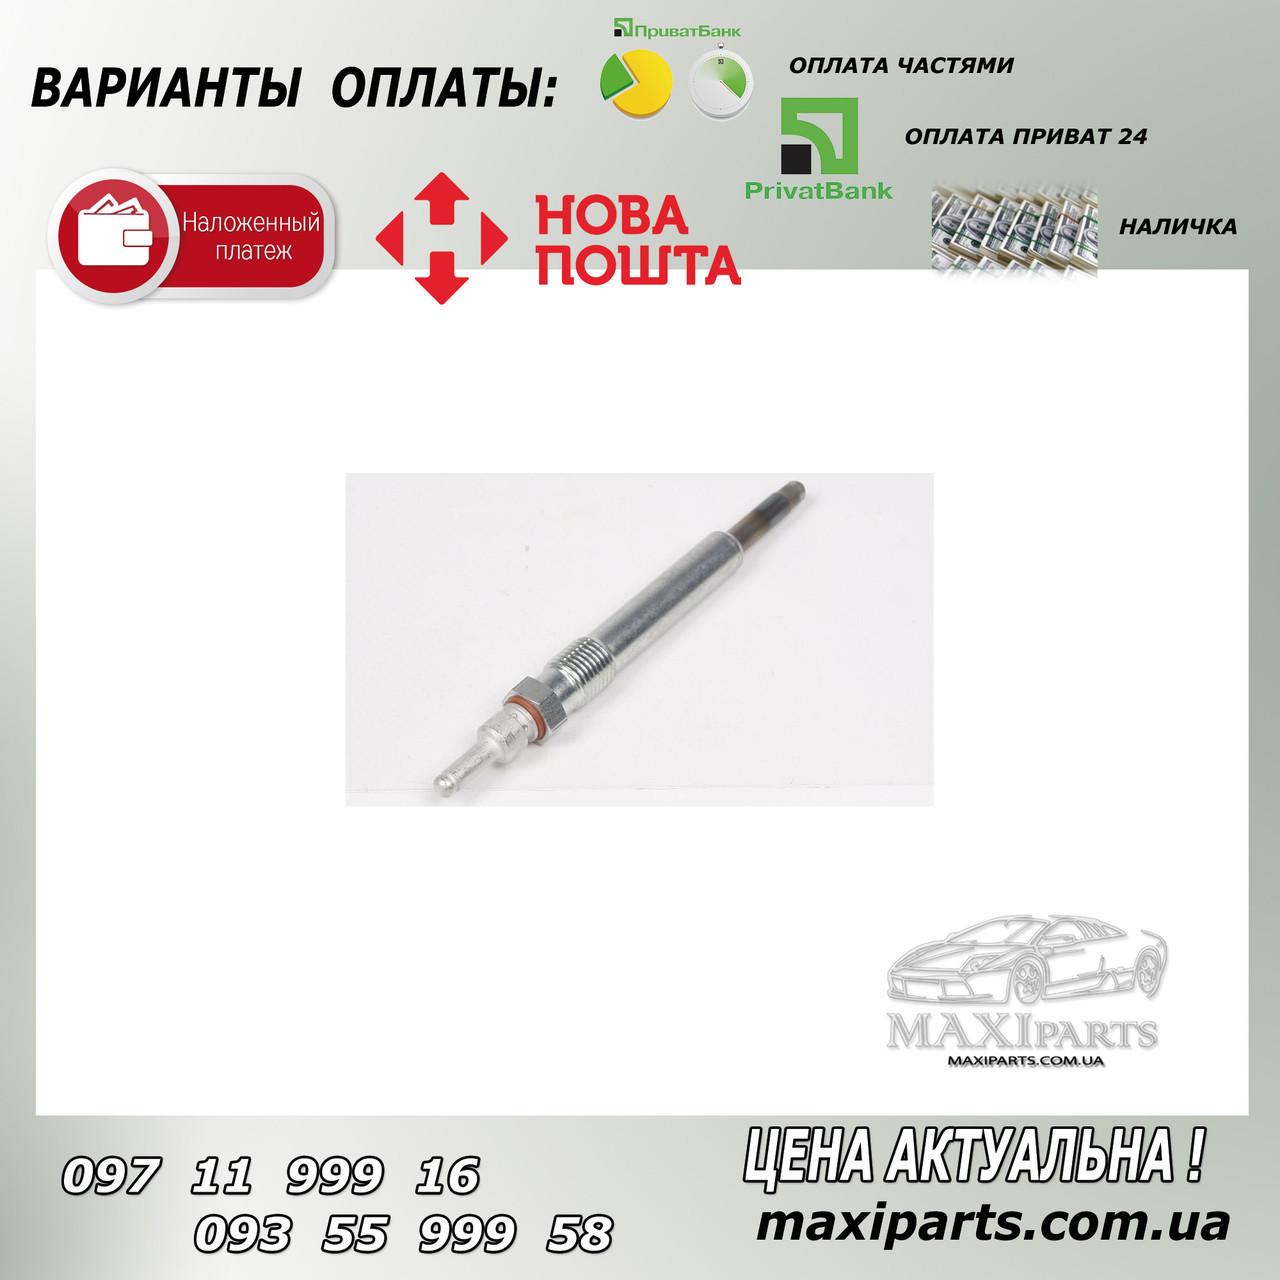 Свеча накала Mercedes OM604-606 11.5V M12x1.25/4.5s